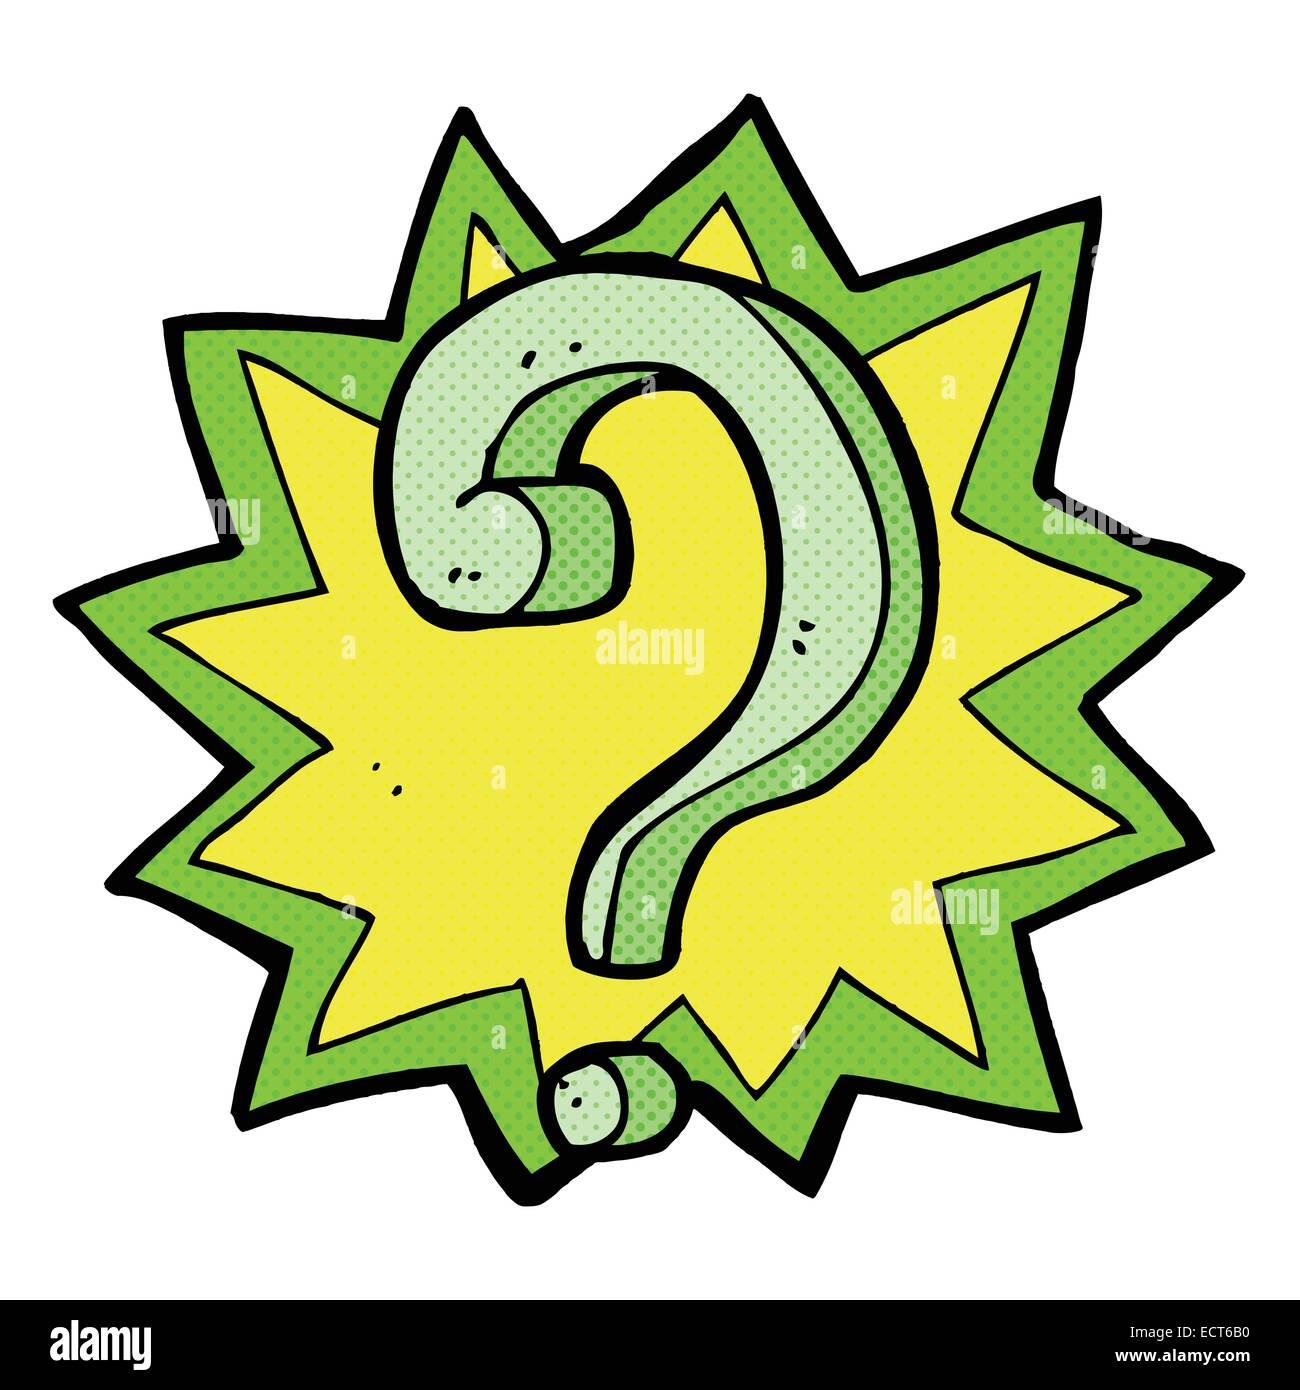 retro comic book style cartoon question mark stock vector art